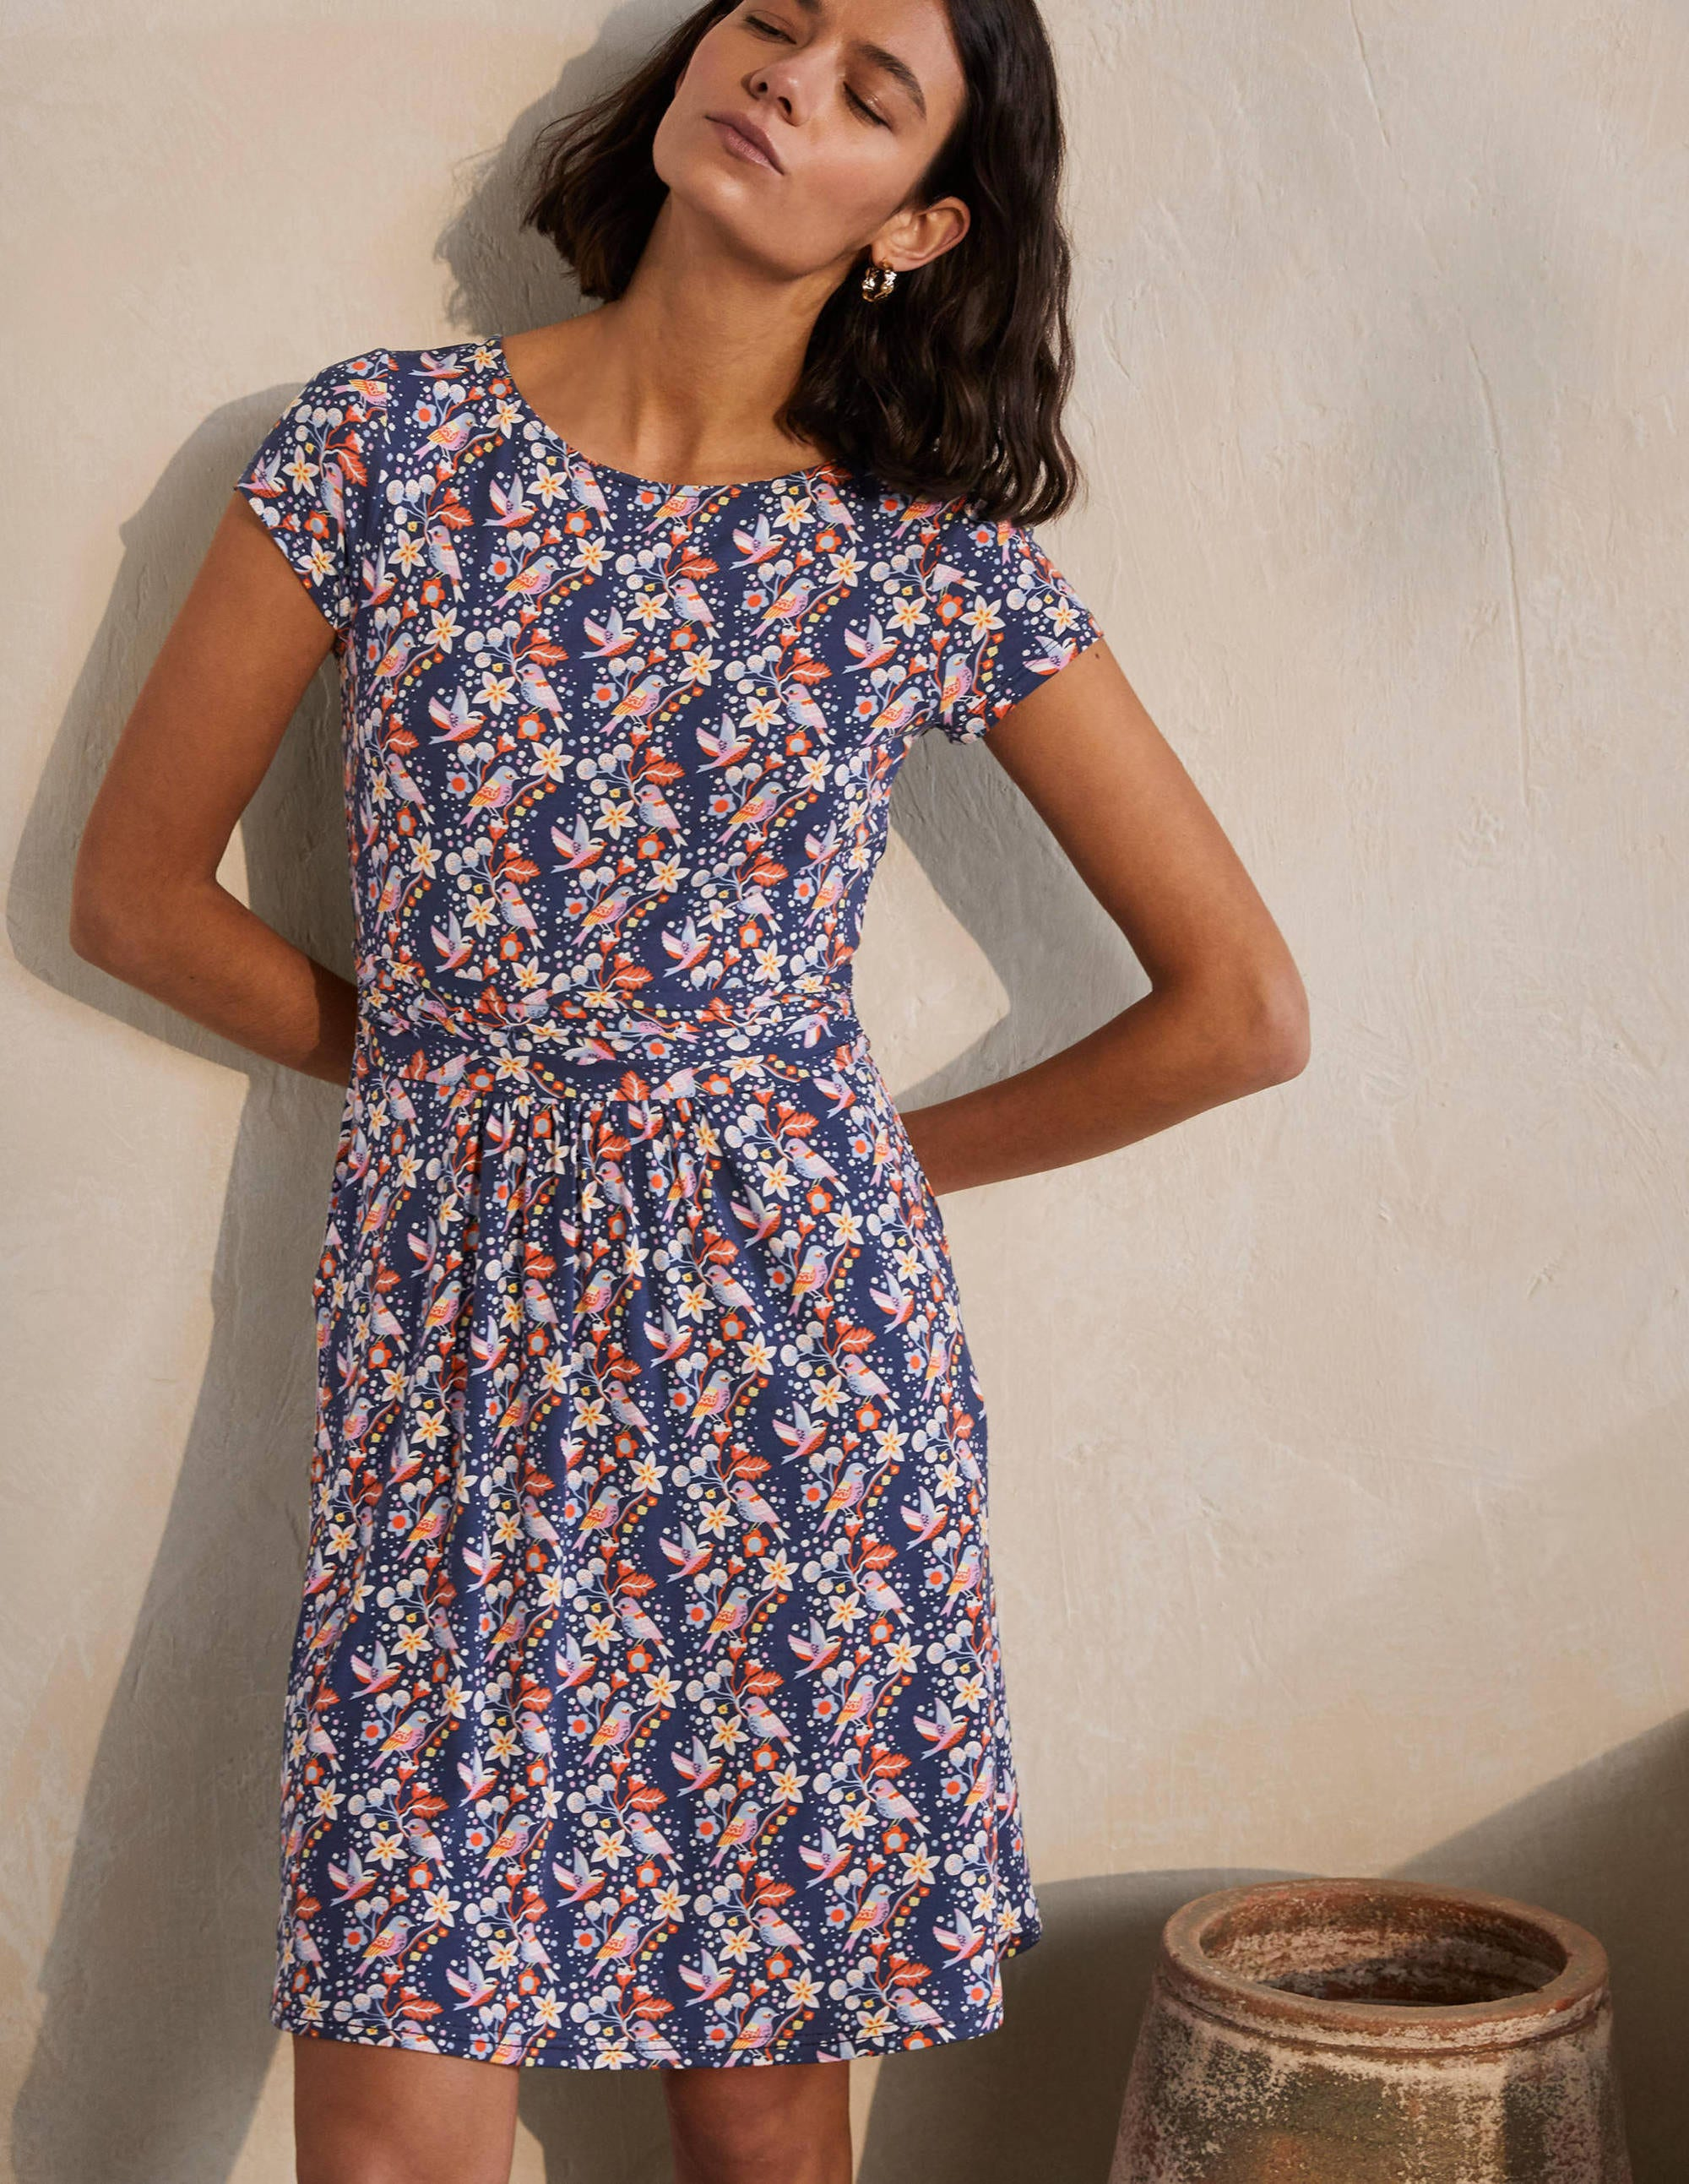 Boden Amelie Jersey Dress - Night Blue, Pretty Bird